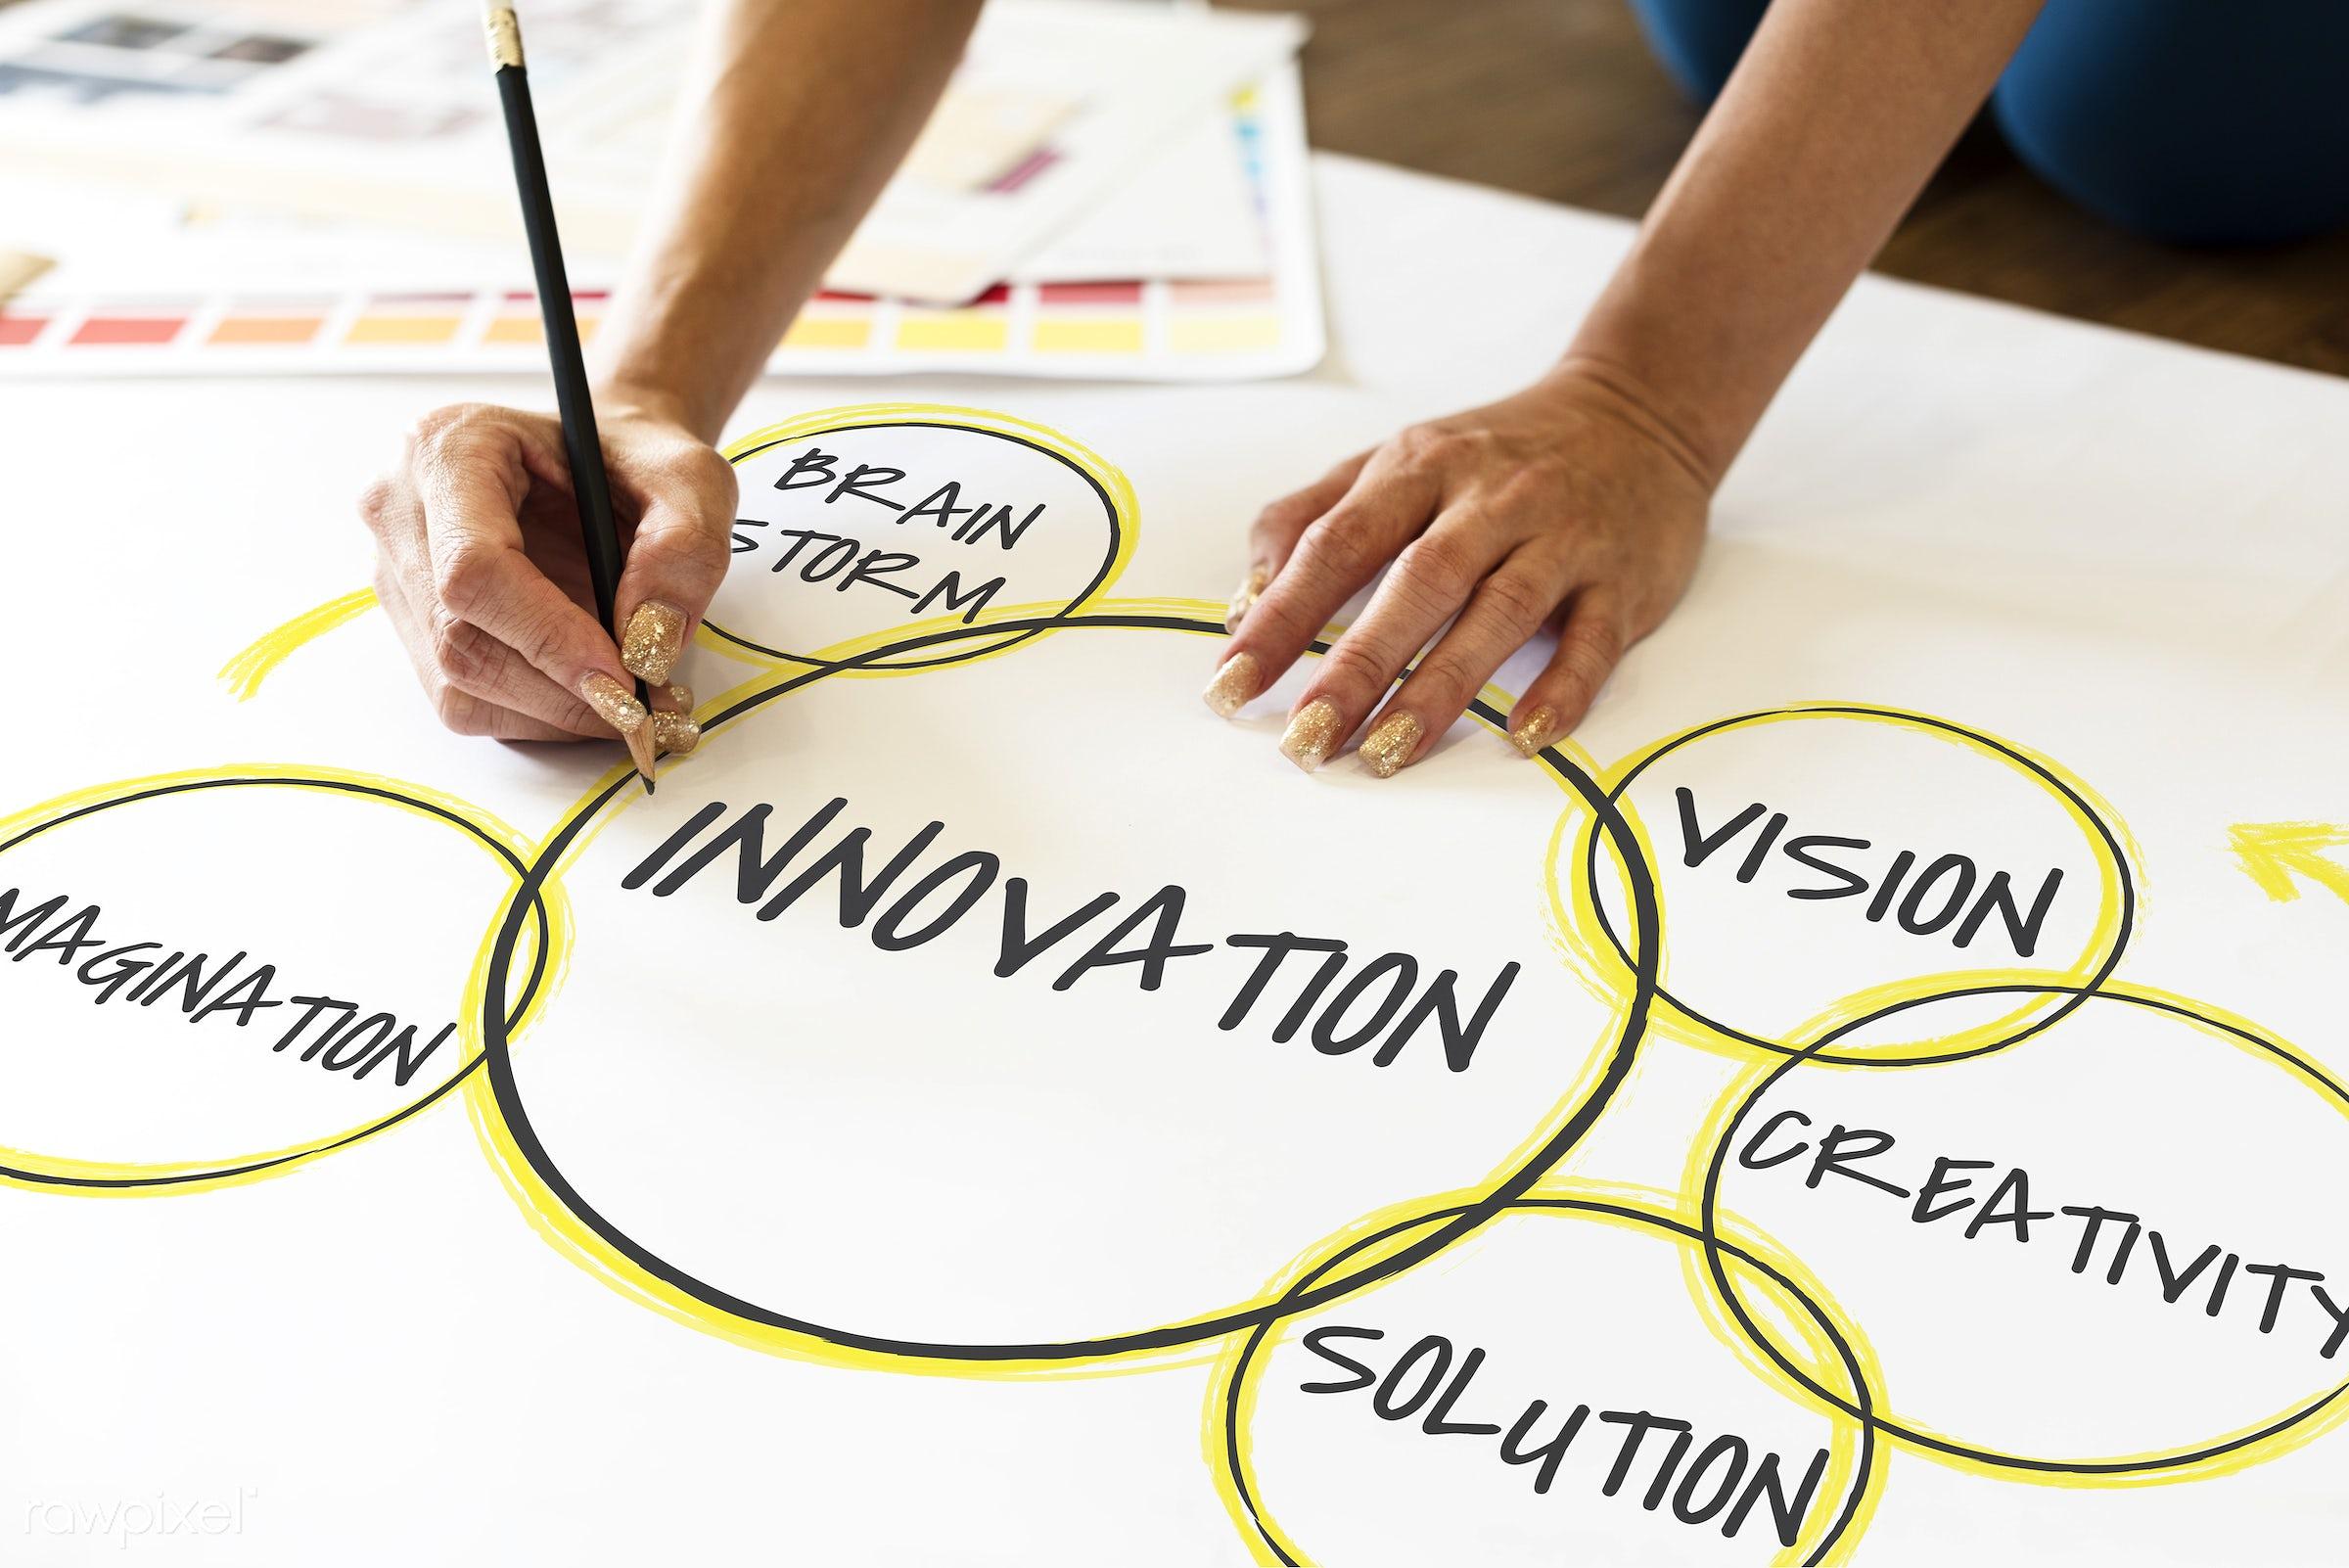 creation, art, brainstorm, creative, creativity, design, development, diagram, direction, drawing, goals, hands, ideas,...